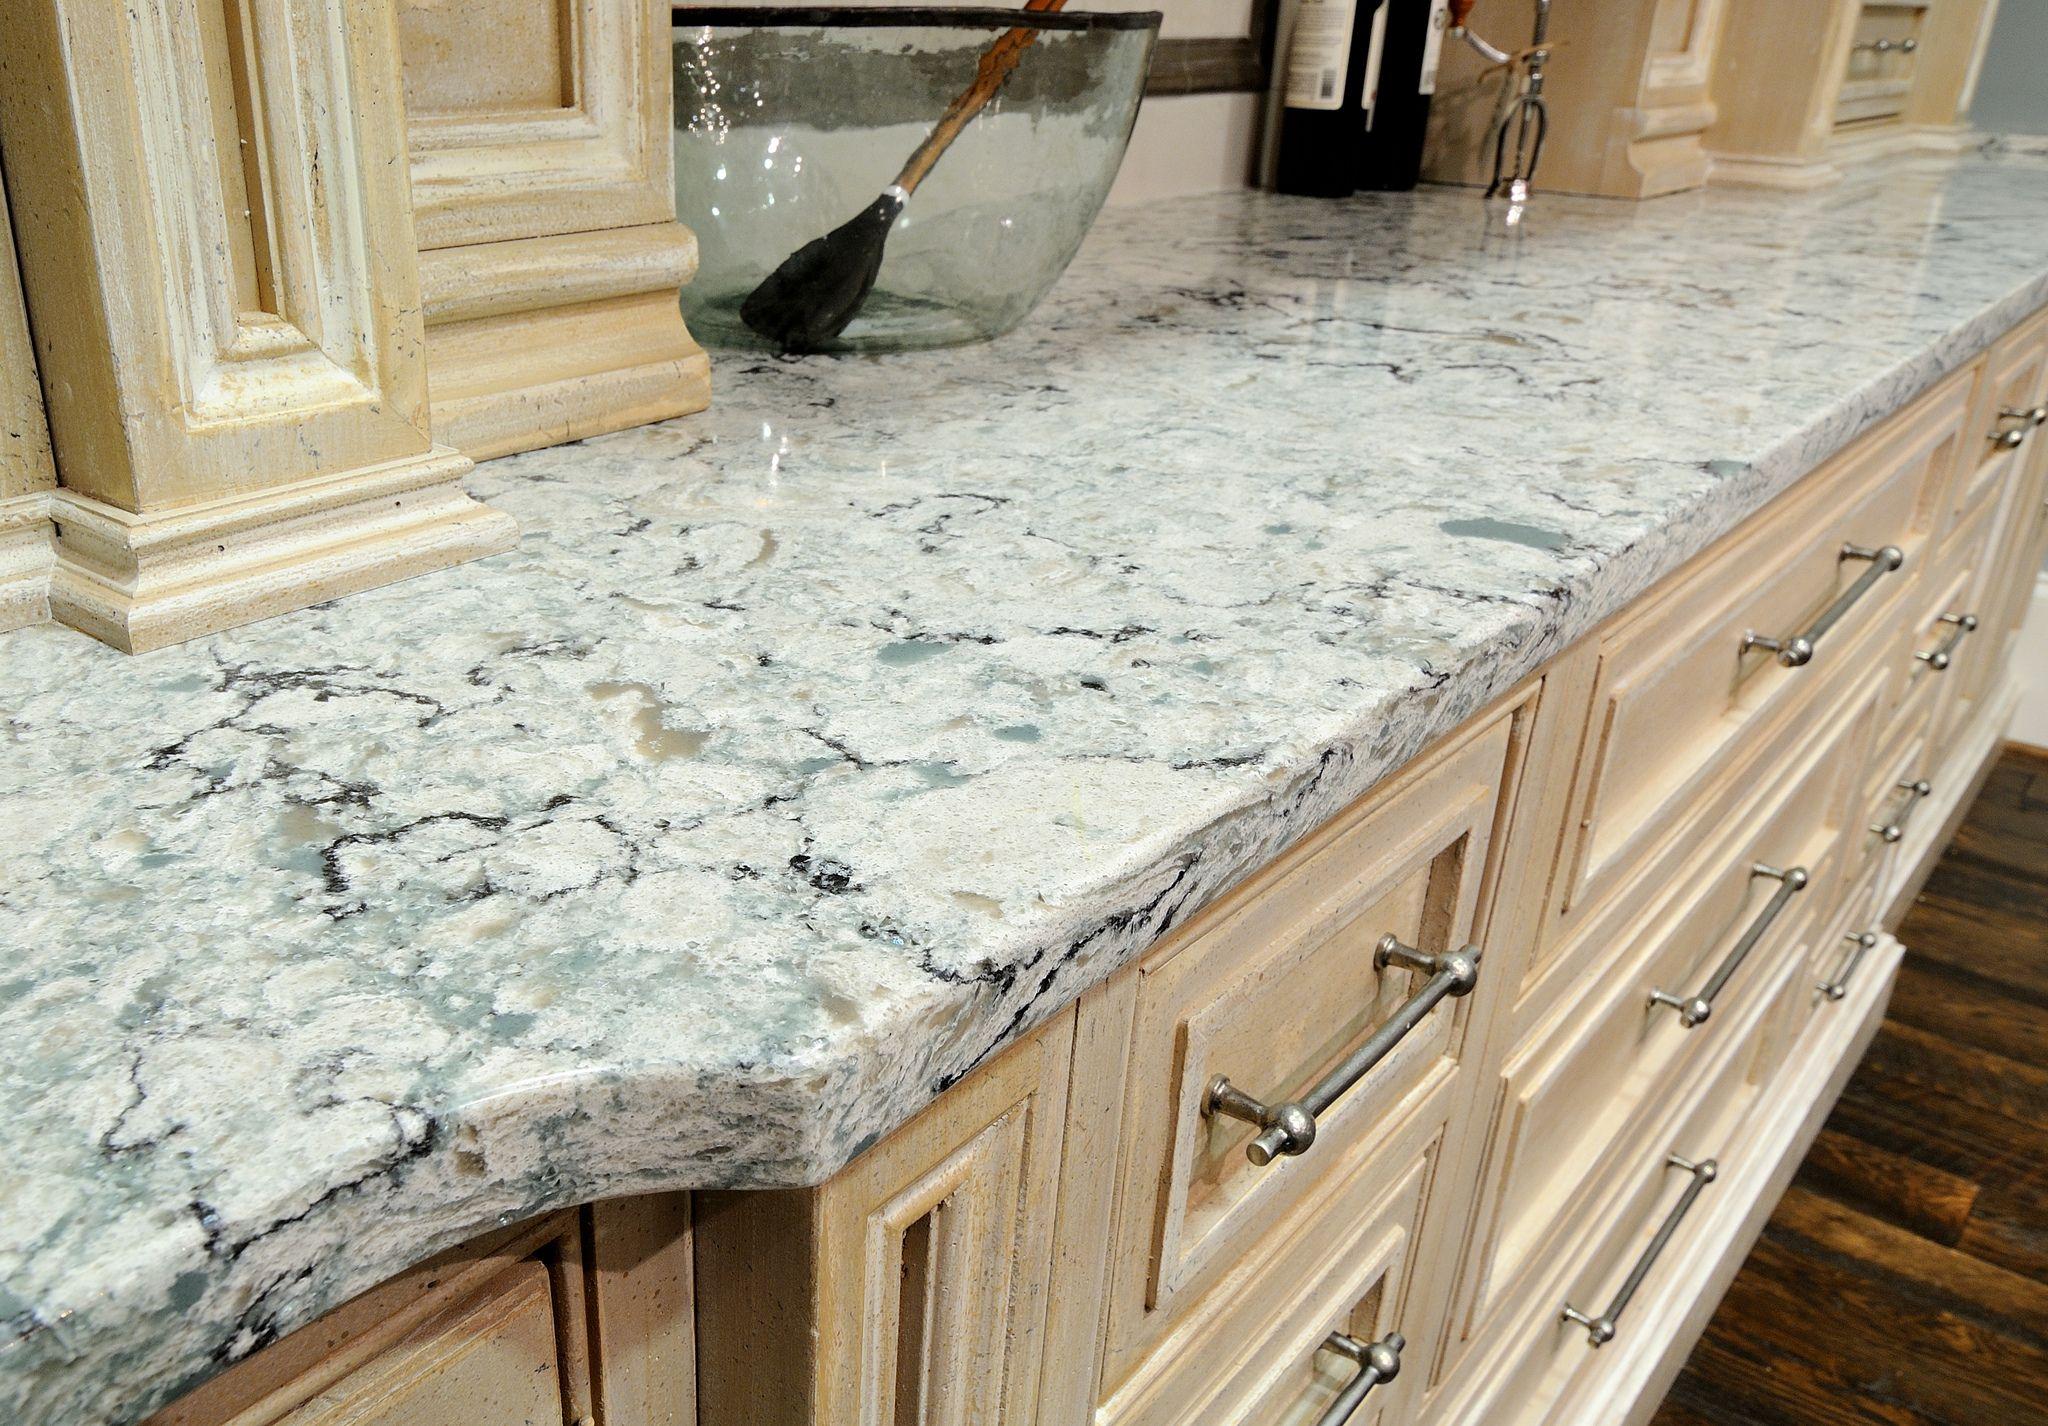 cambria granite kitchen countertops prices 17 best ideas about Quartz Countertops Prices on Pinterest Cambria quartz countertops Quartz countertops